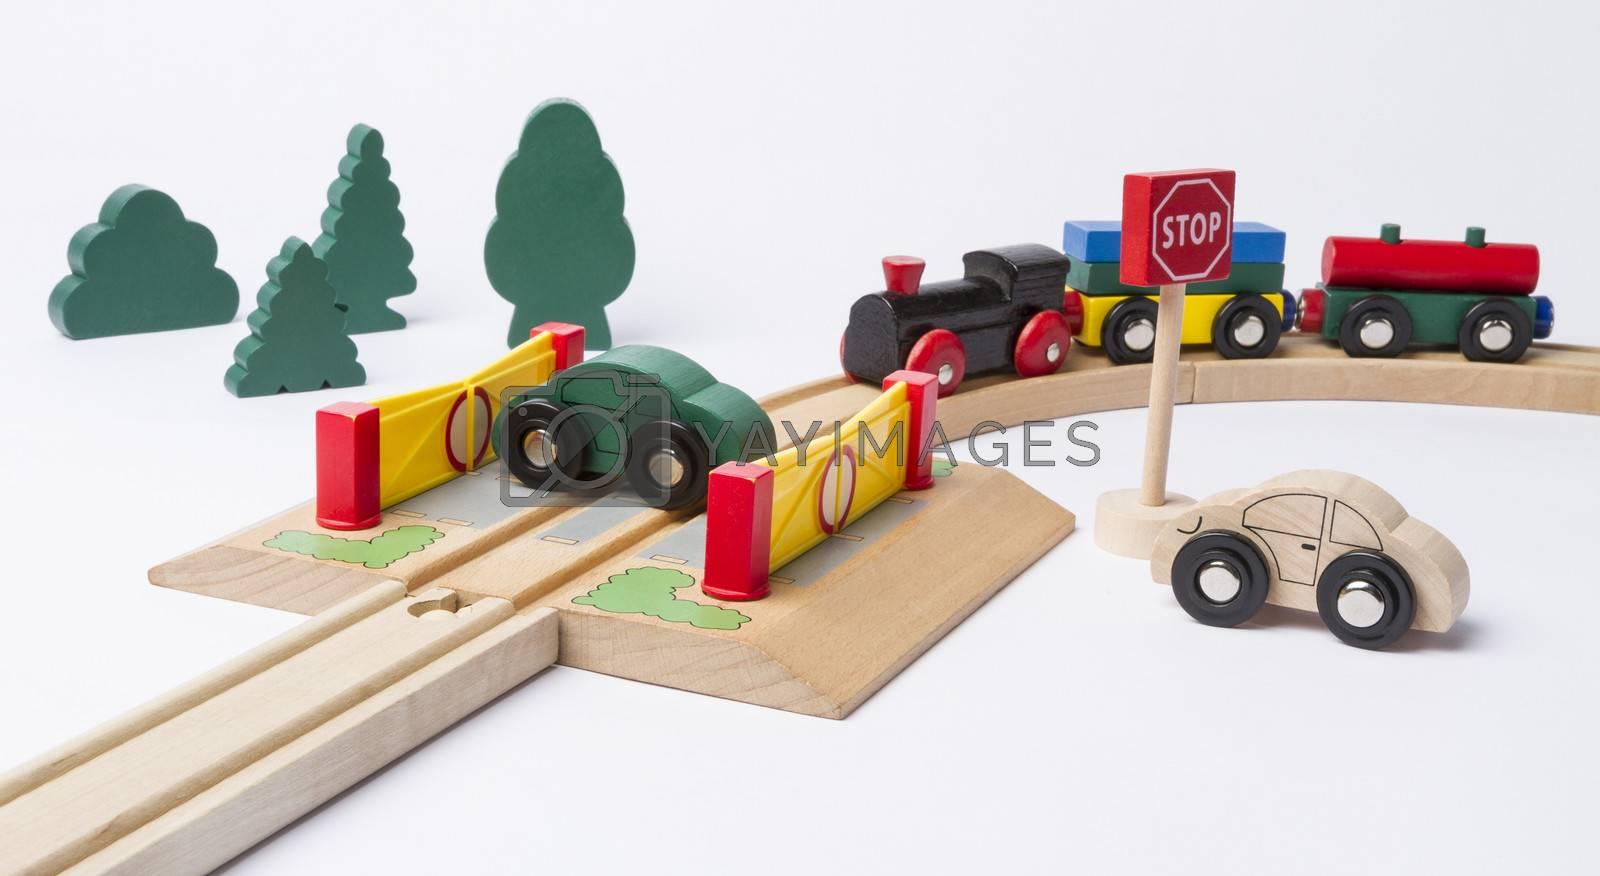 car on crossing with train coming. horizontal image. studio shot